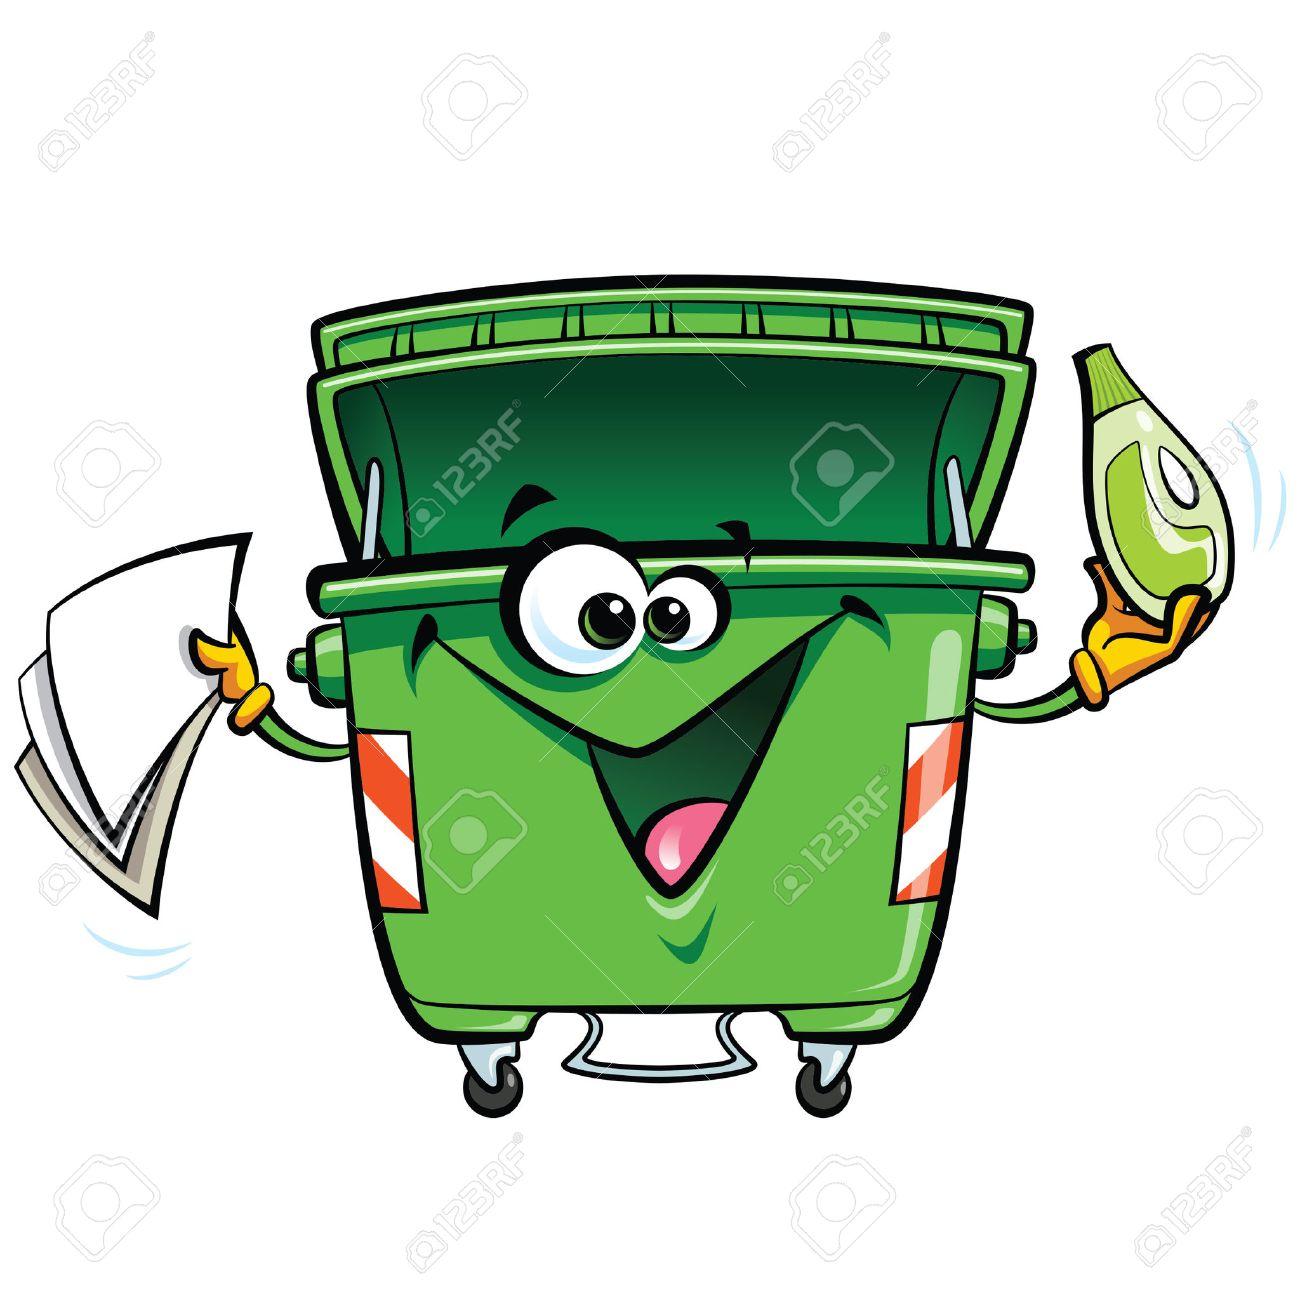 papelera de reciclaje feliz sonriente de la historieta de la basura bin carcter reutilizar